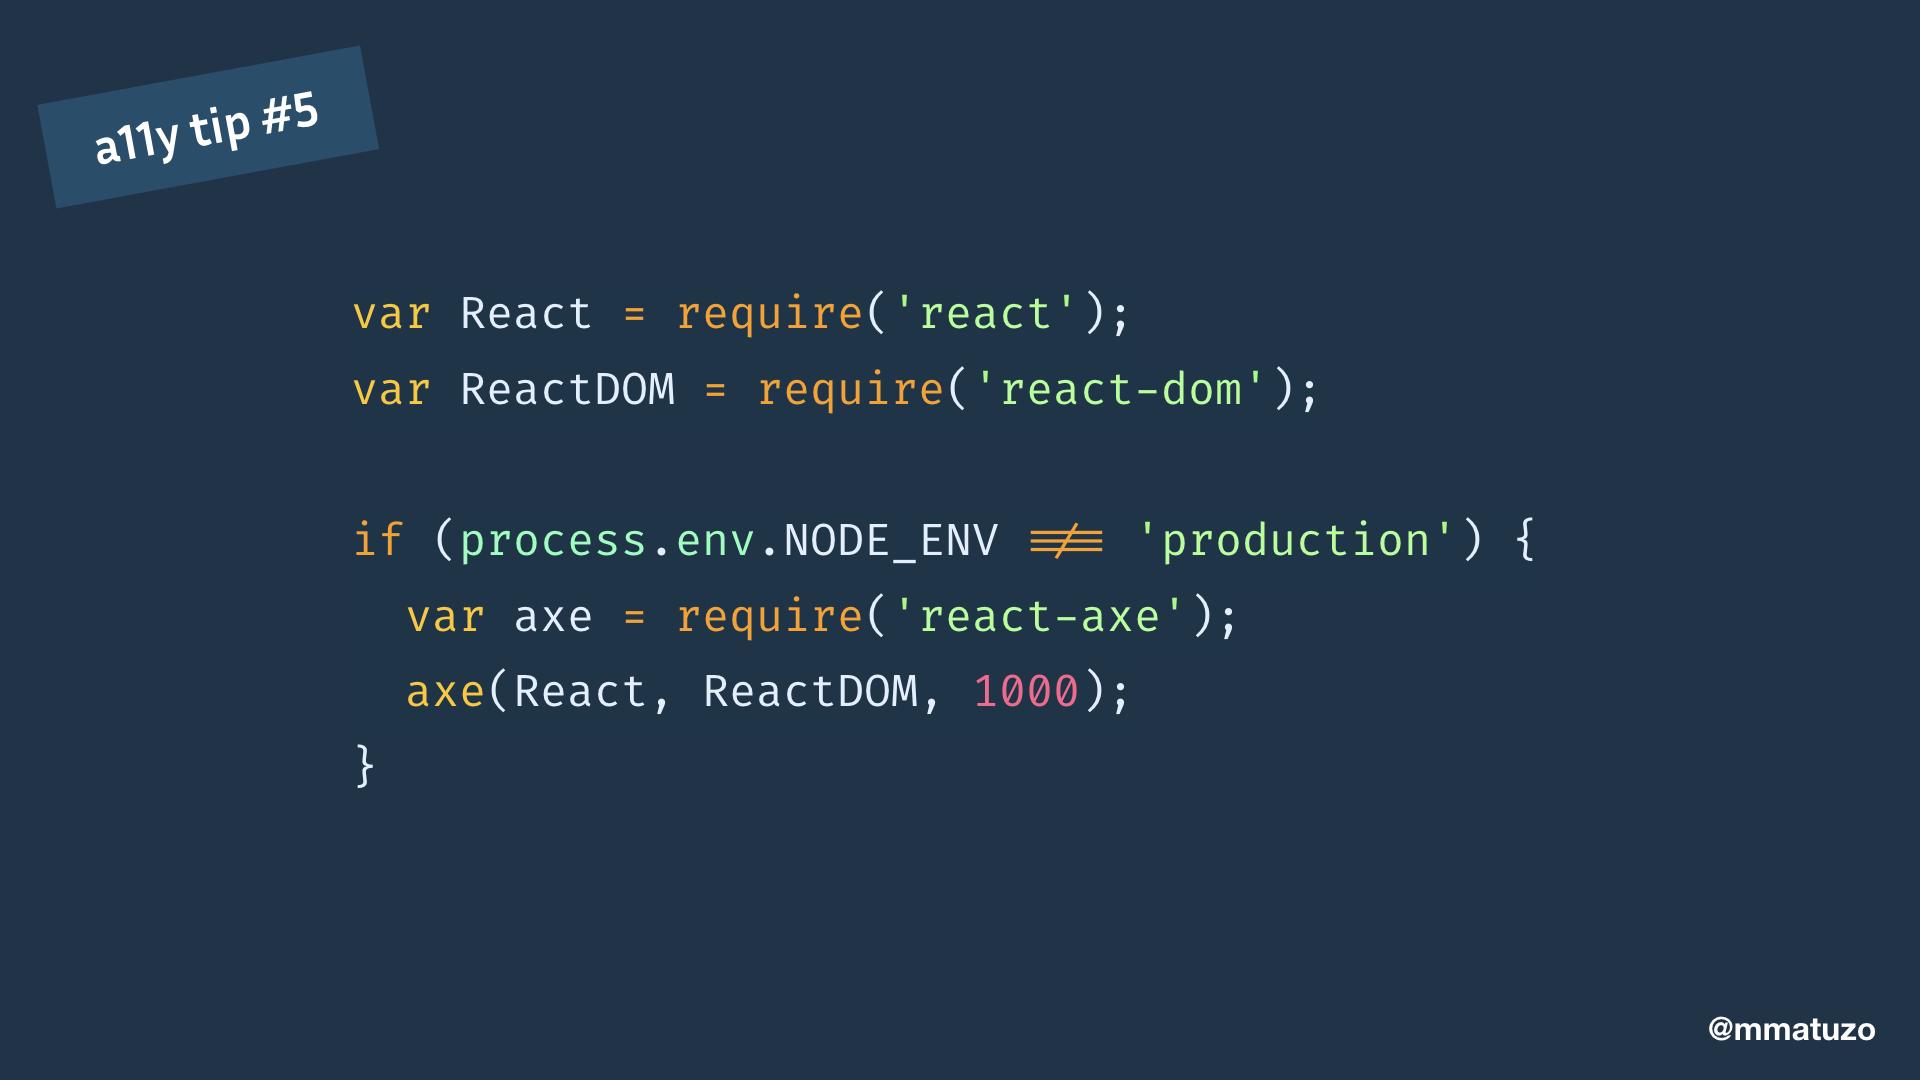 var React = require('react'); var ReactDOM = require('react-dom'); if (process.env.NODE_ENV !== 'production') { var axe = require('react-axe'); axe(React, ReactDOM, 1000); }